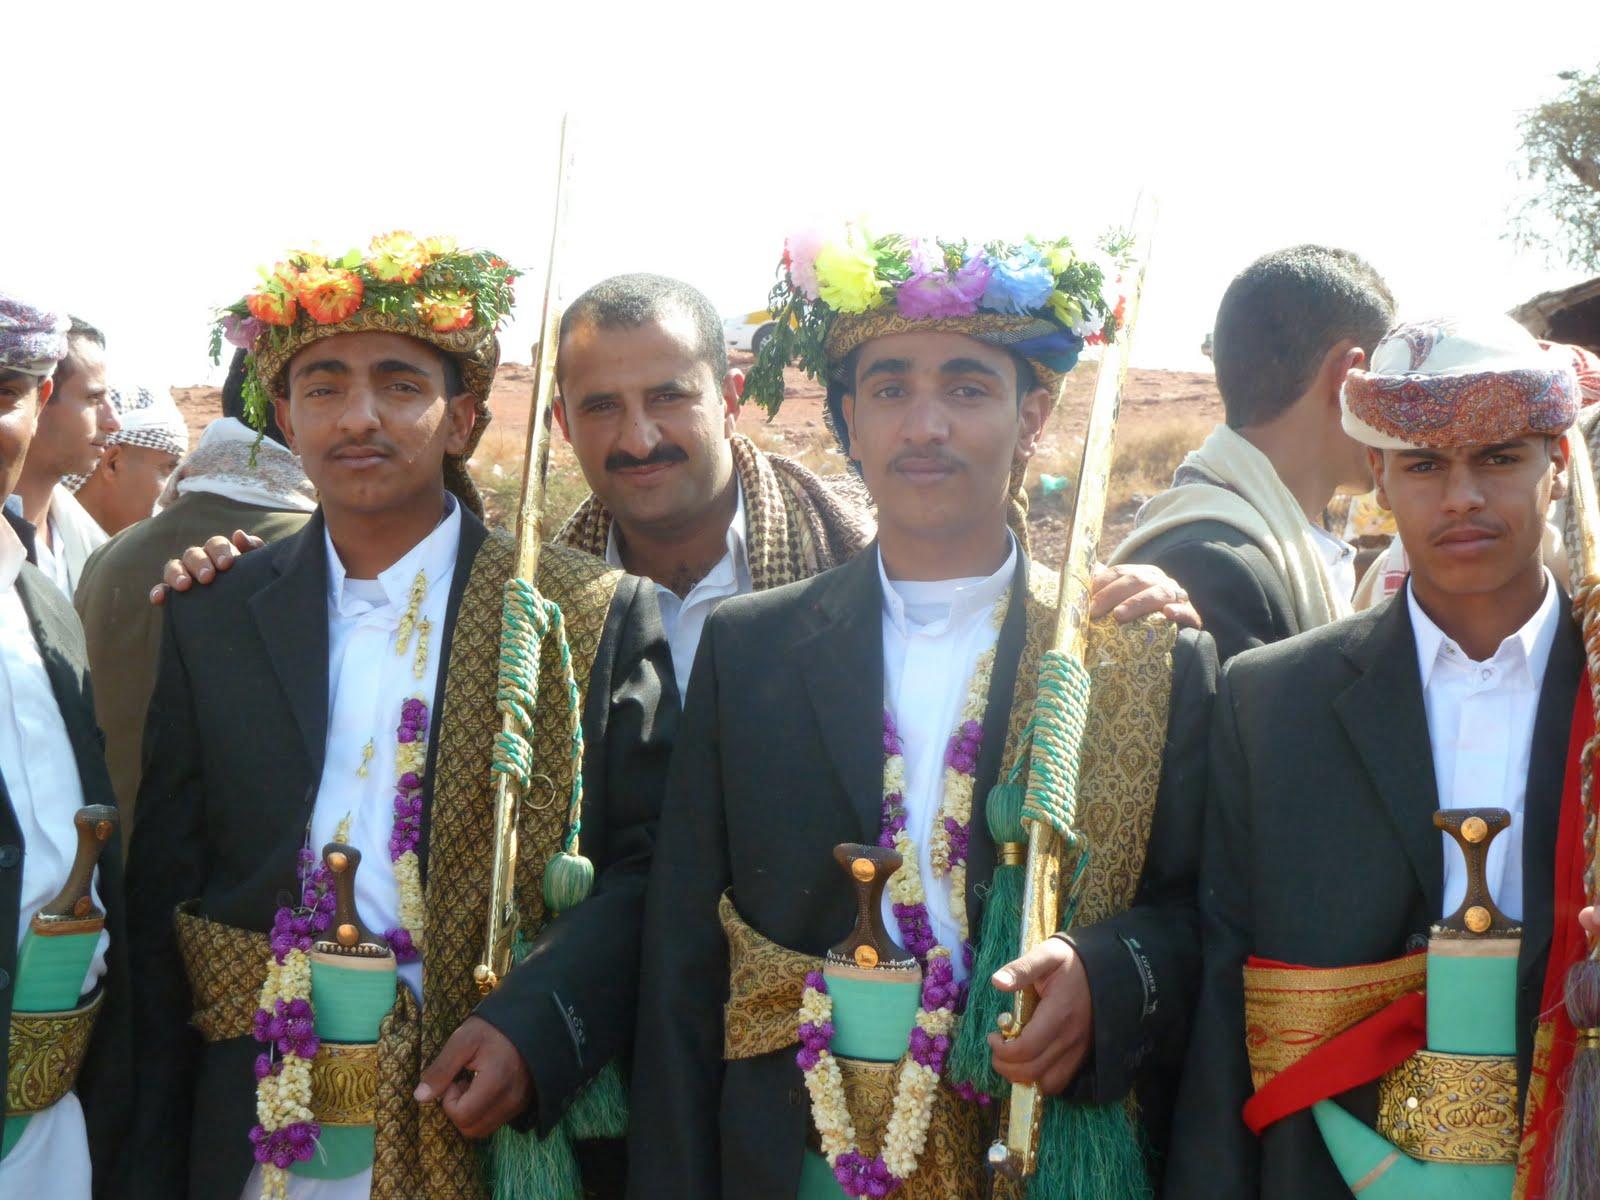 The Wanderer: Yemeni weddingmens celebration